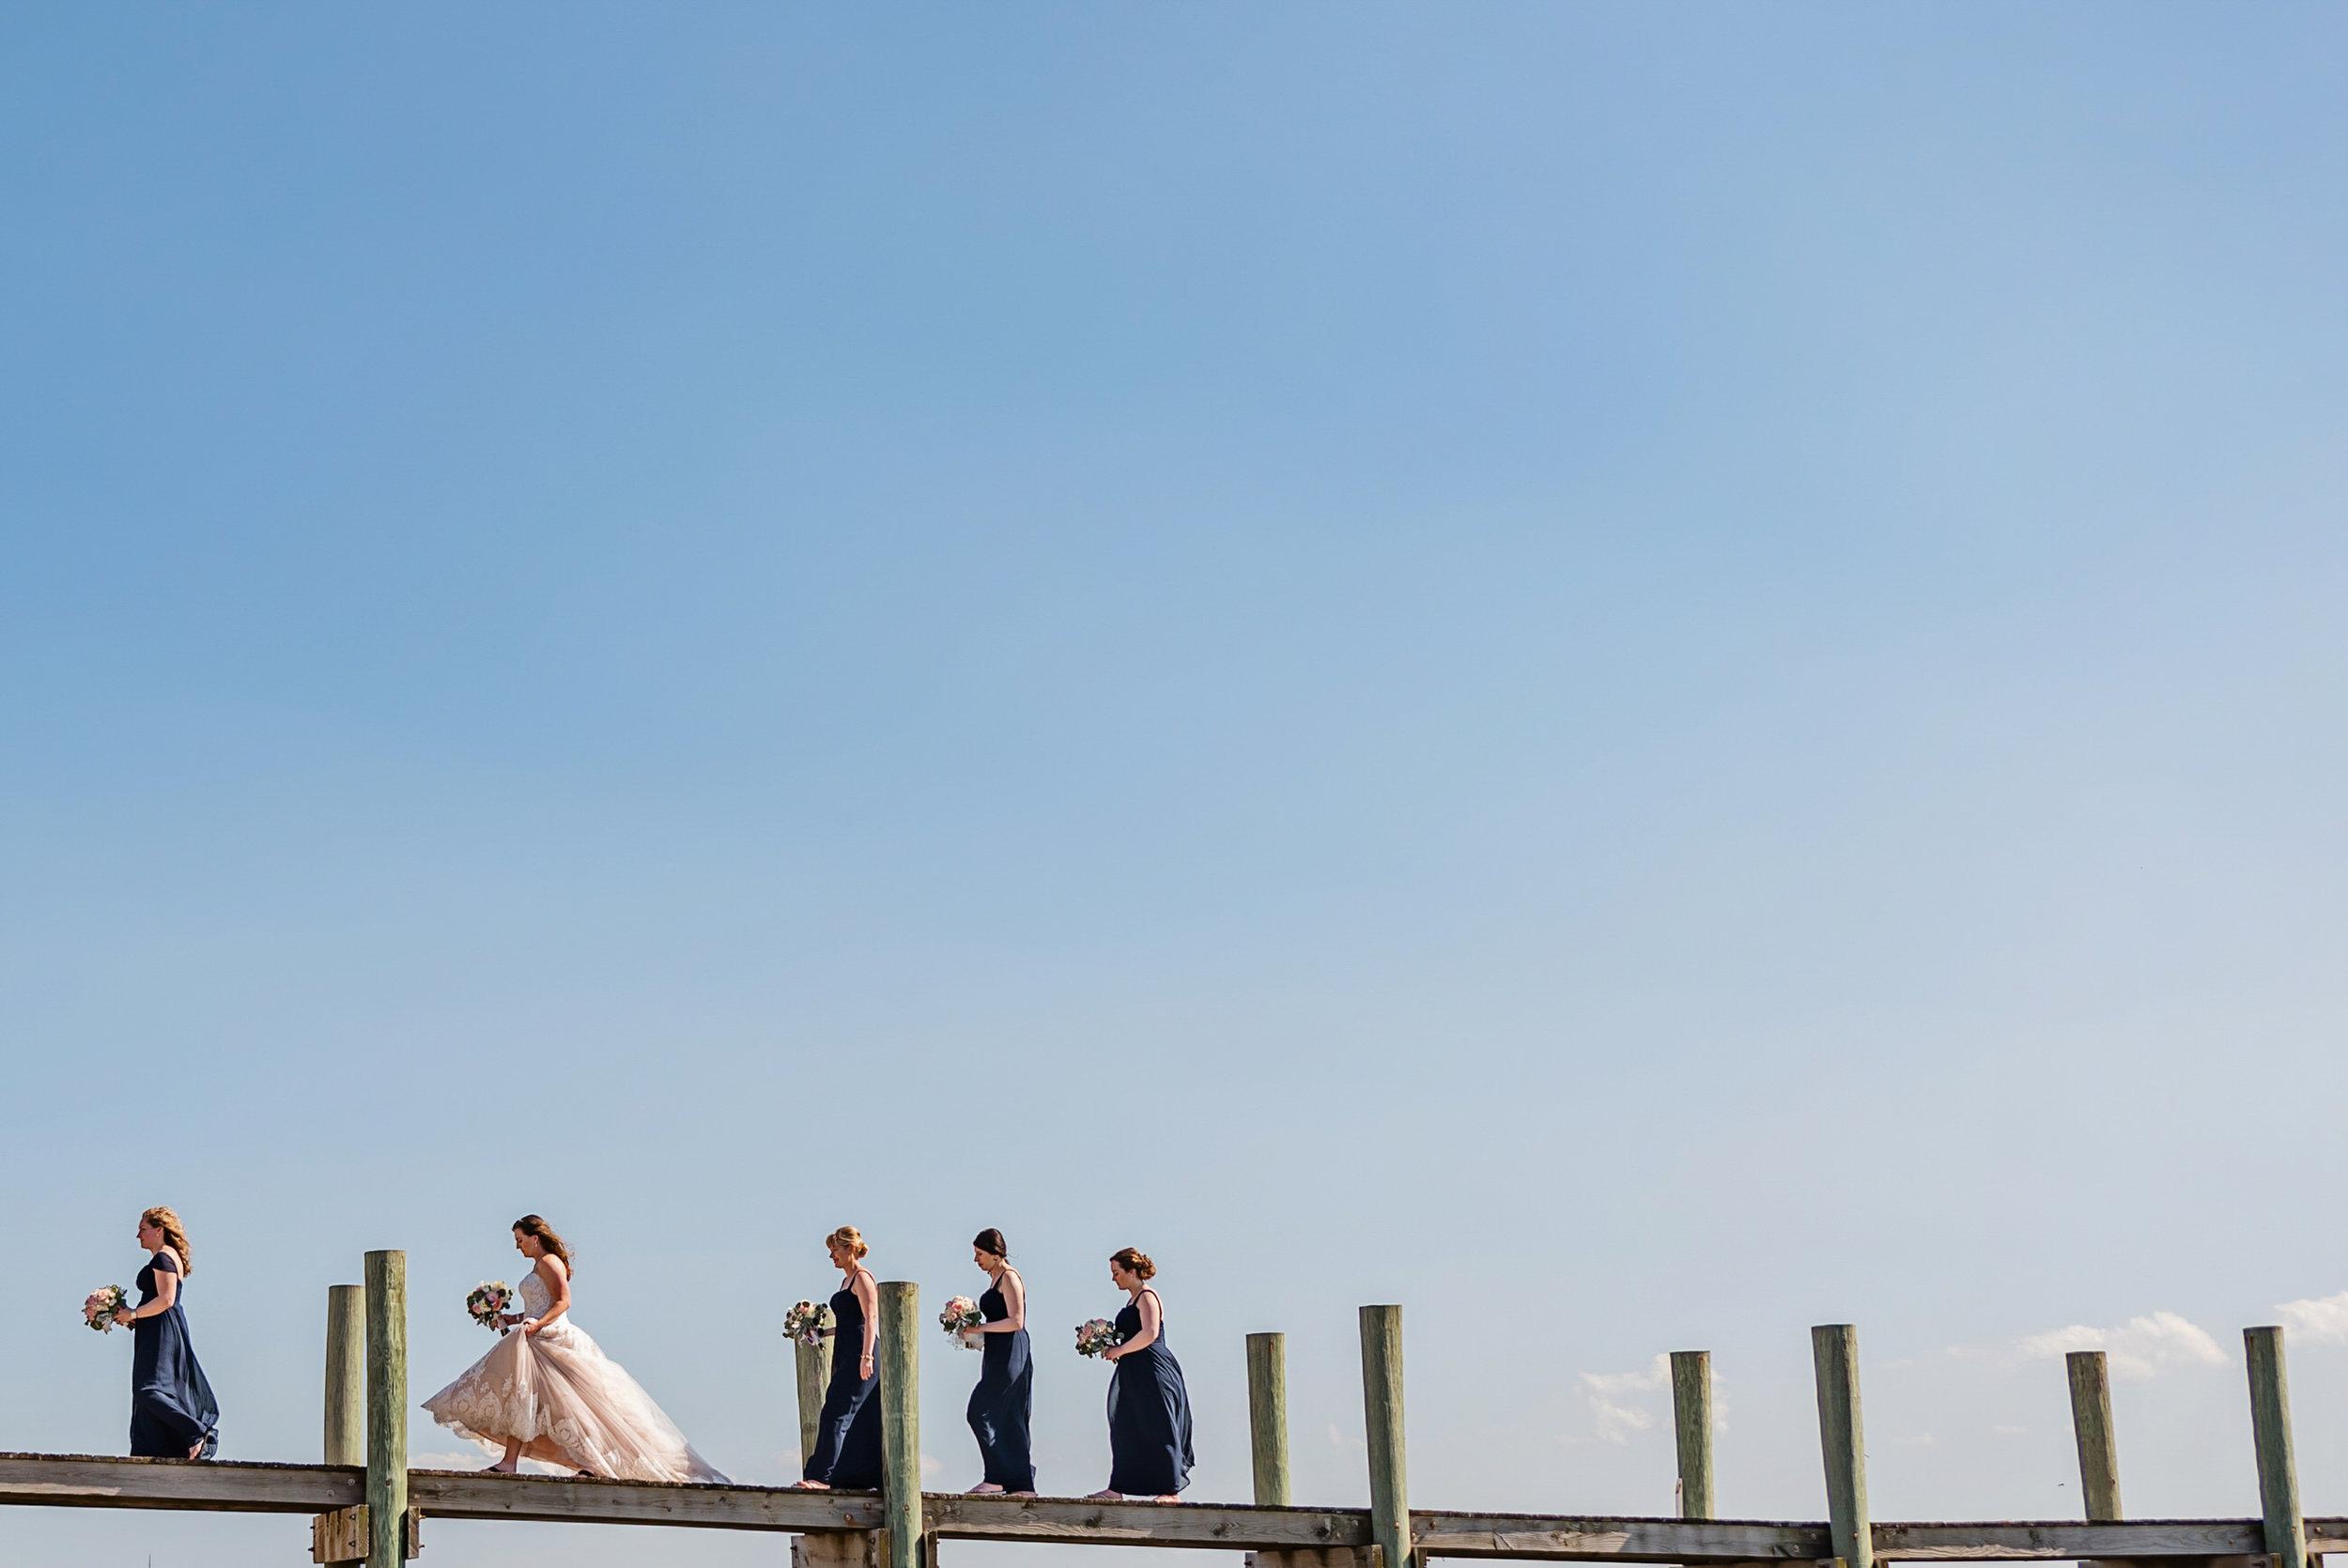 HarbourRidgeFloridaWedding-Andrea&Sean-WeddingParty-151.jpg